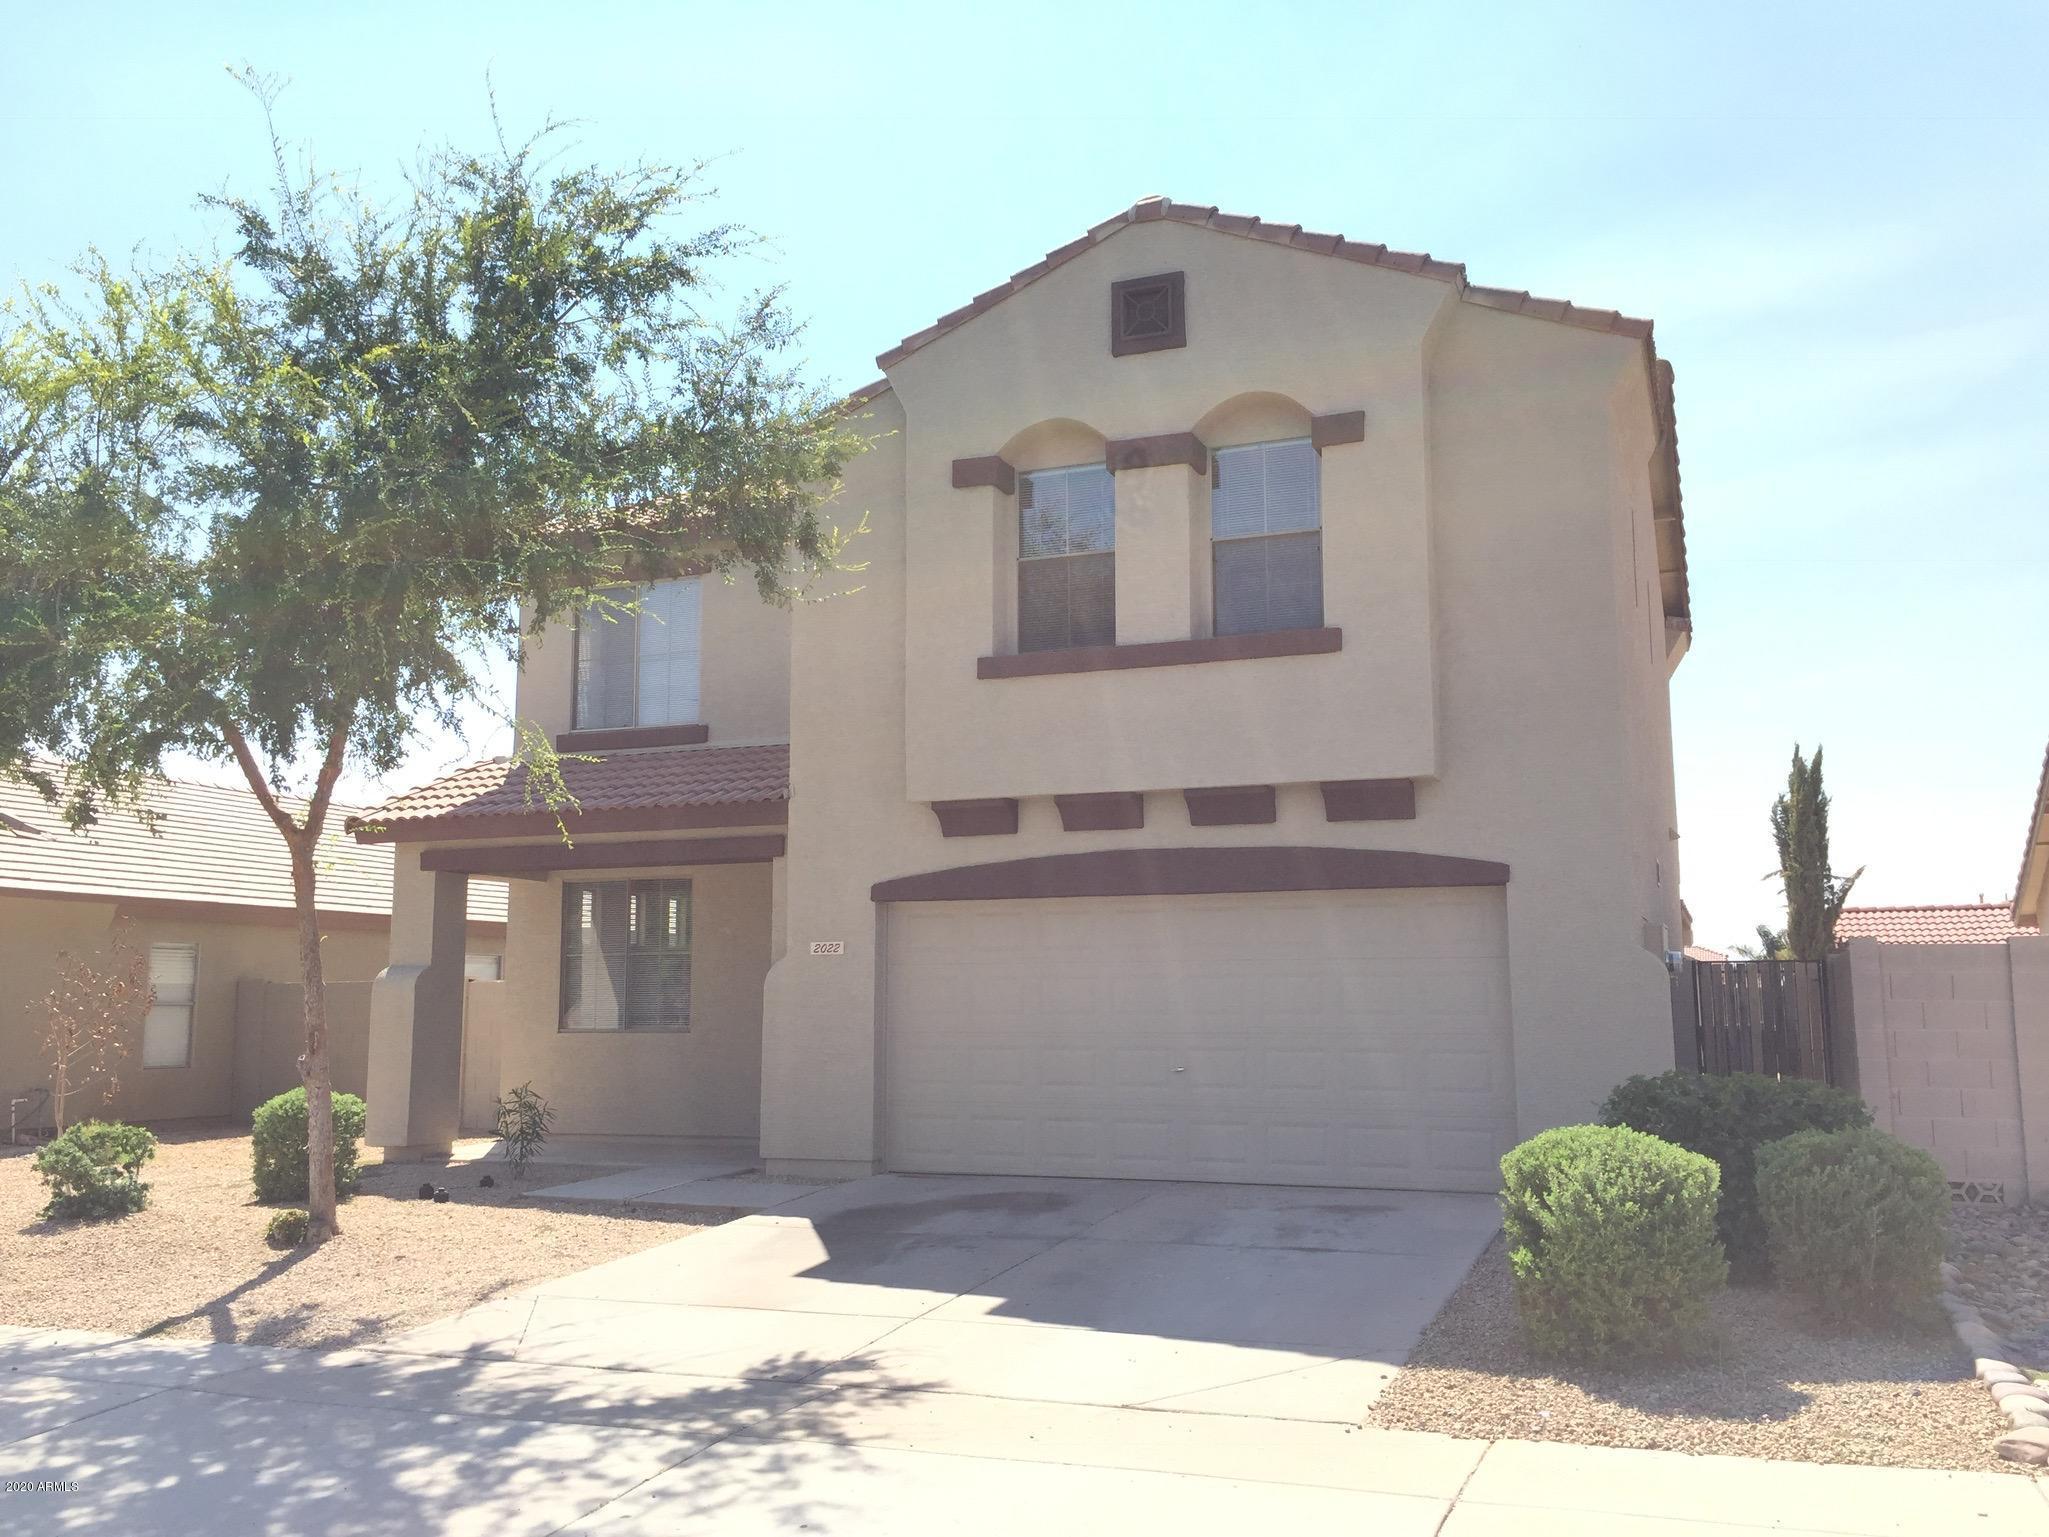 MLS 6088273 2022 S 85TH Avenue, Tolleson, AZ 85353